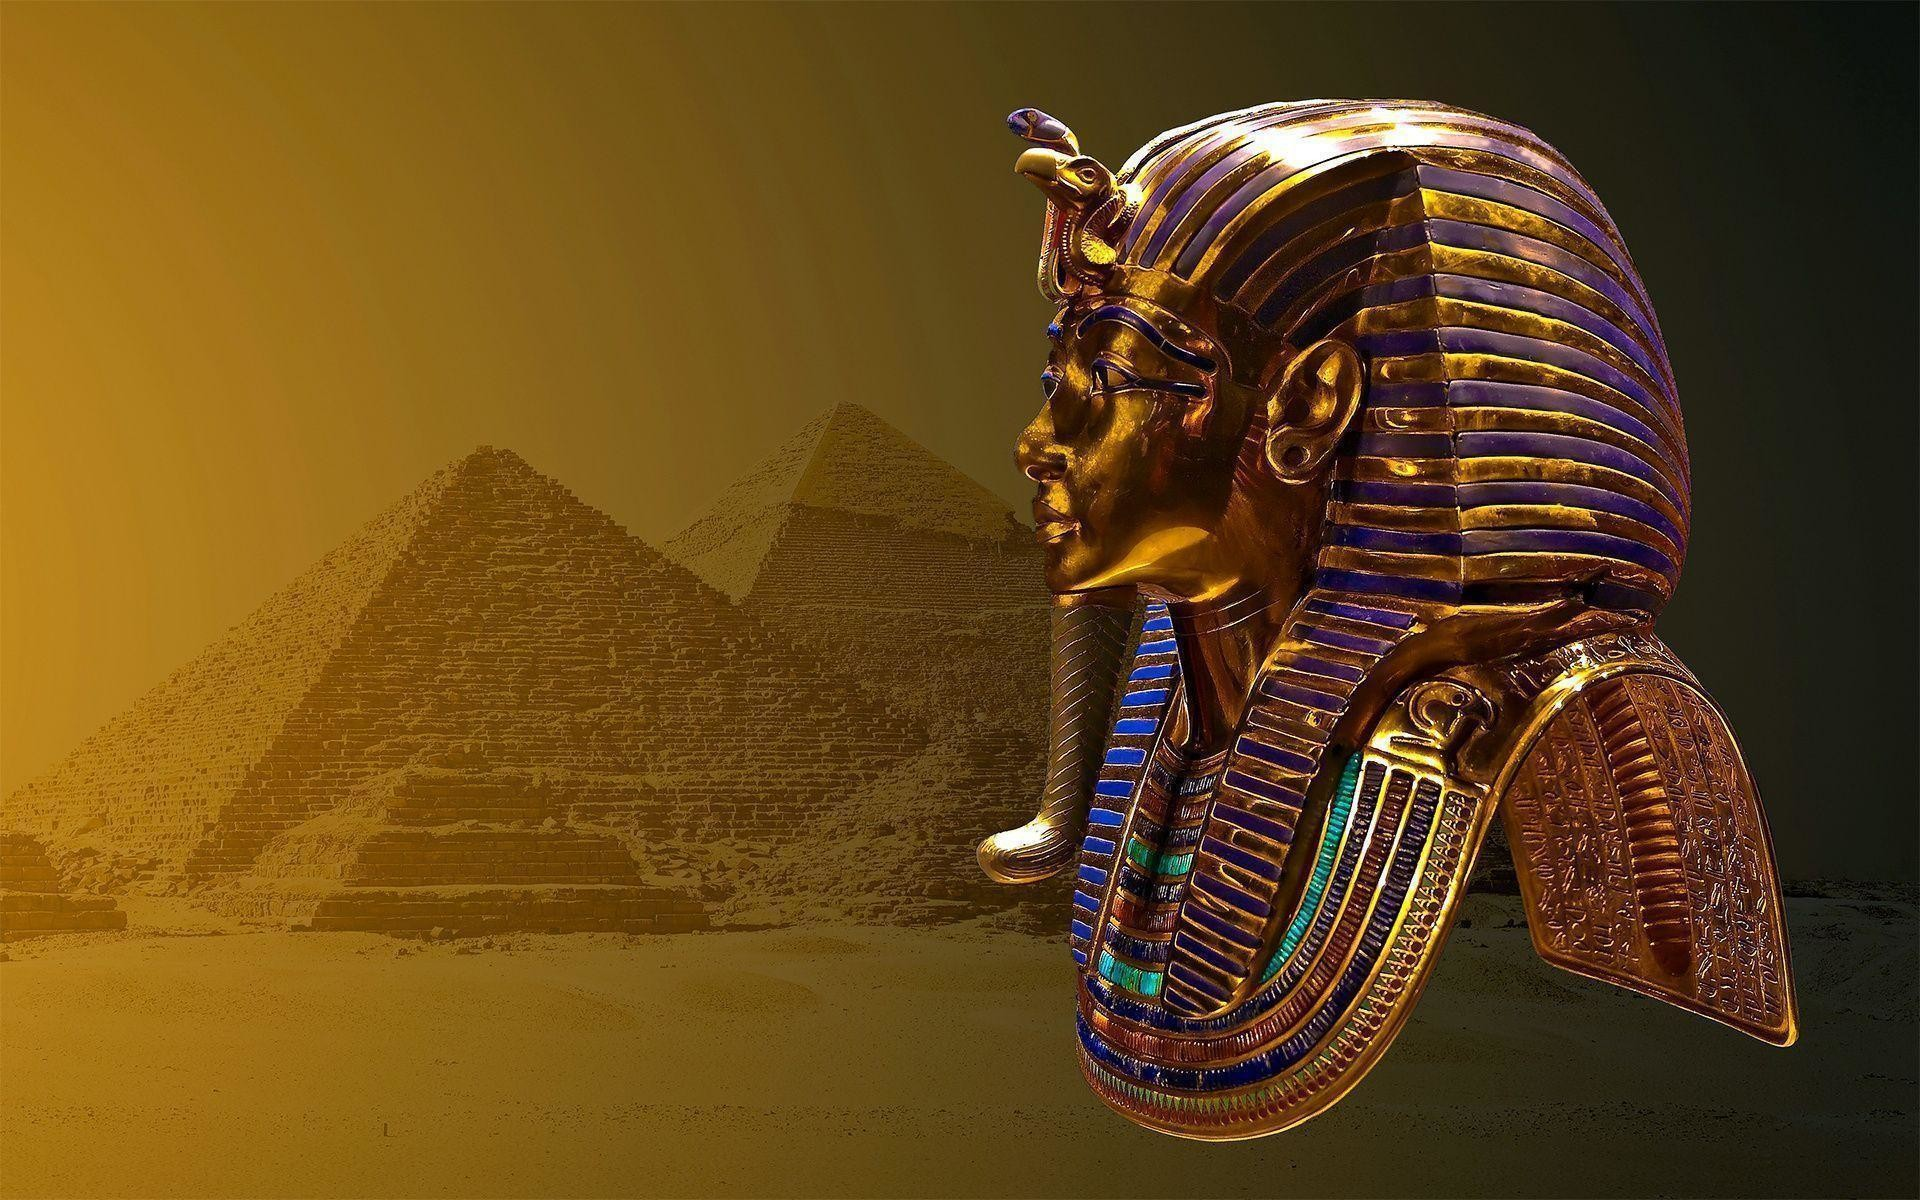 pharaoh mask HD wallpaper | Wallpaper